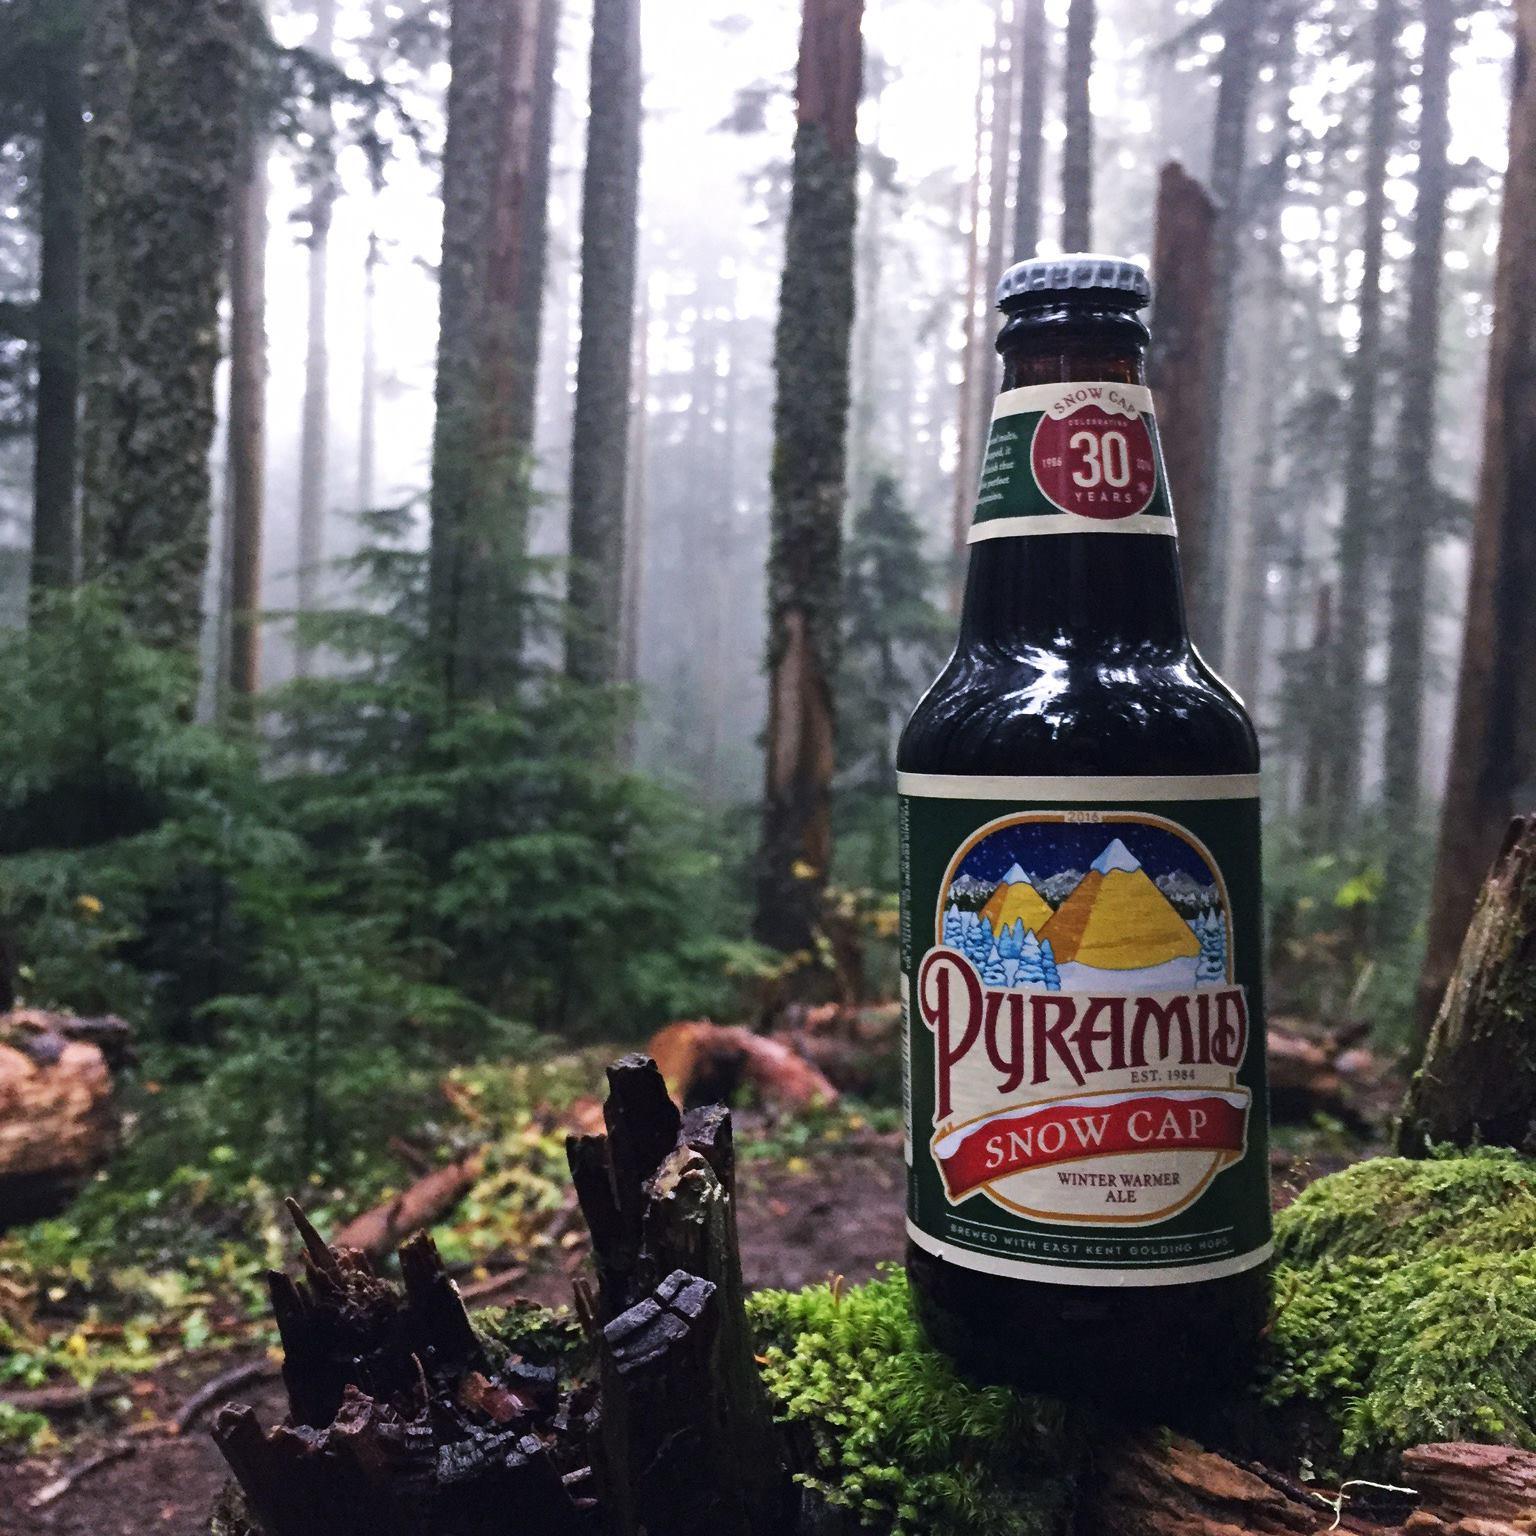 Pyramid Brewing's winter seasonal Snow Cap Winter Warmer Ale. (image courtesy of Pyramid Brewing)